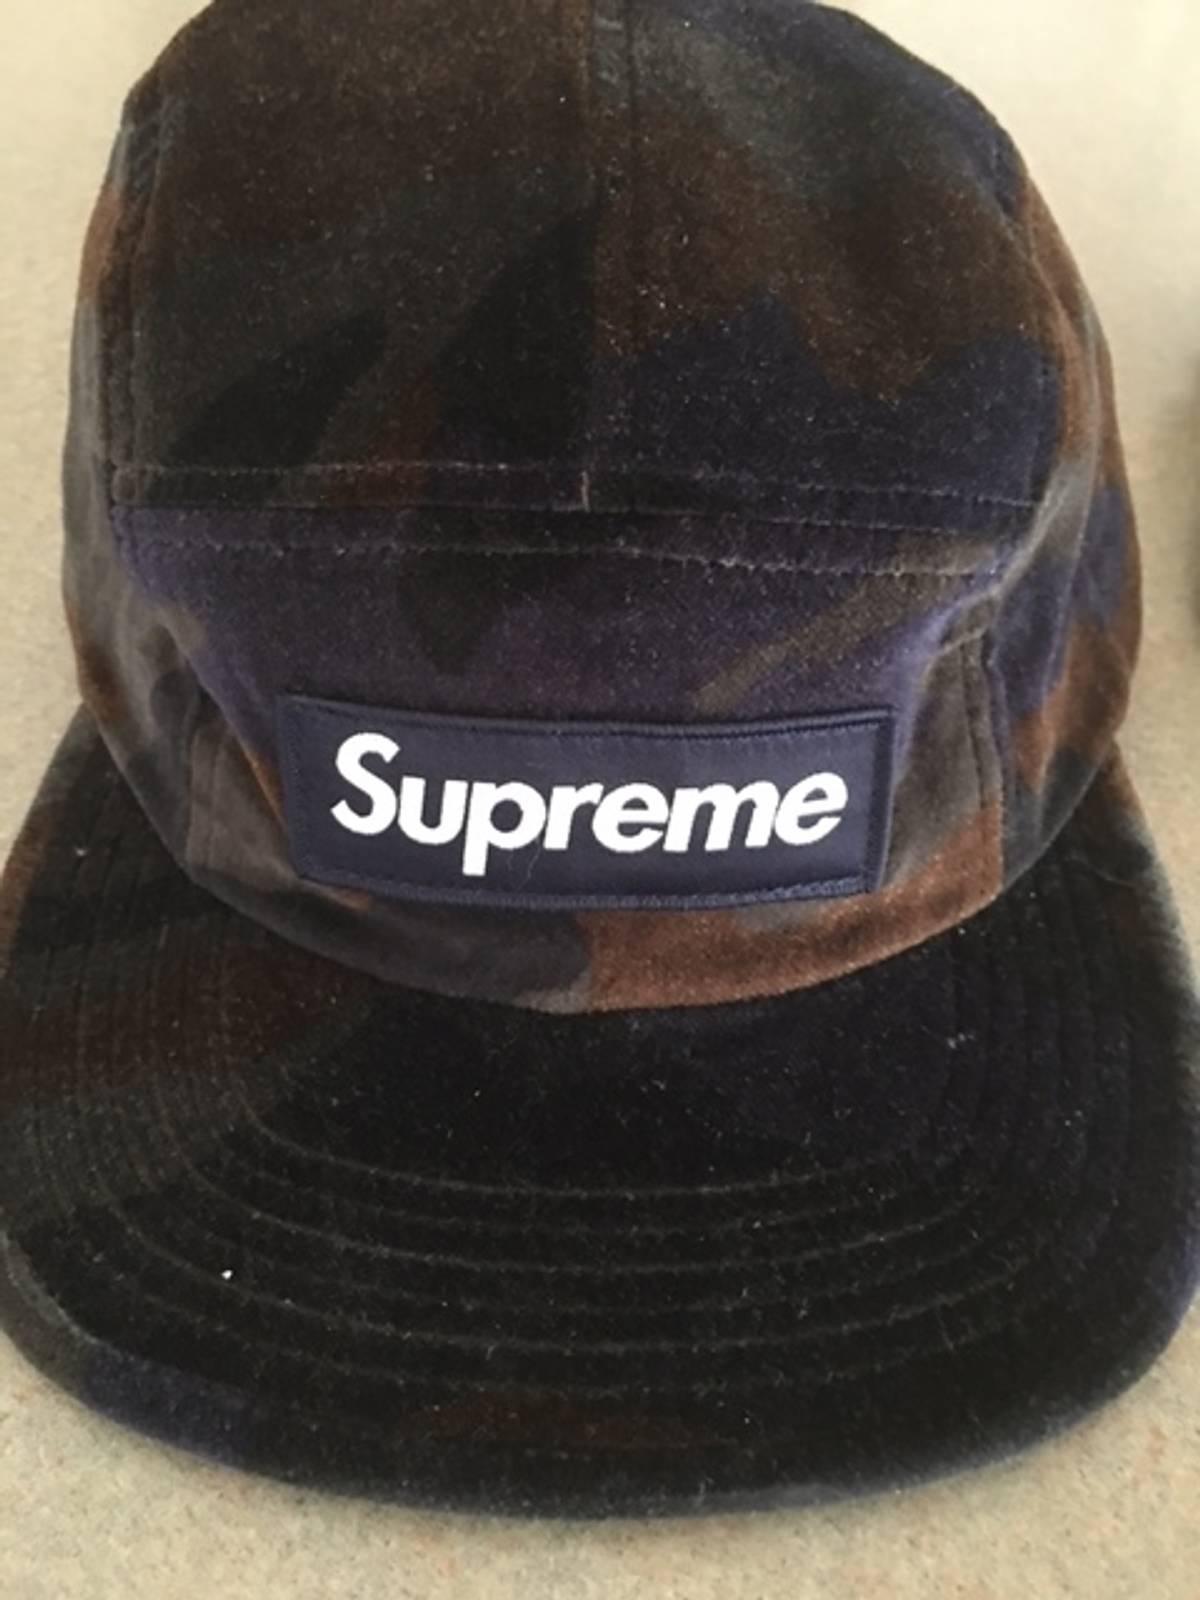 1ff0ea9826d Supreme Velvet Camo Camp Cap Size one size - Hats for Sale - Grailed